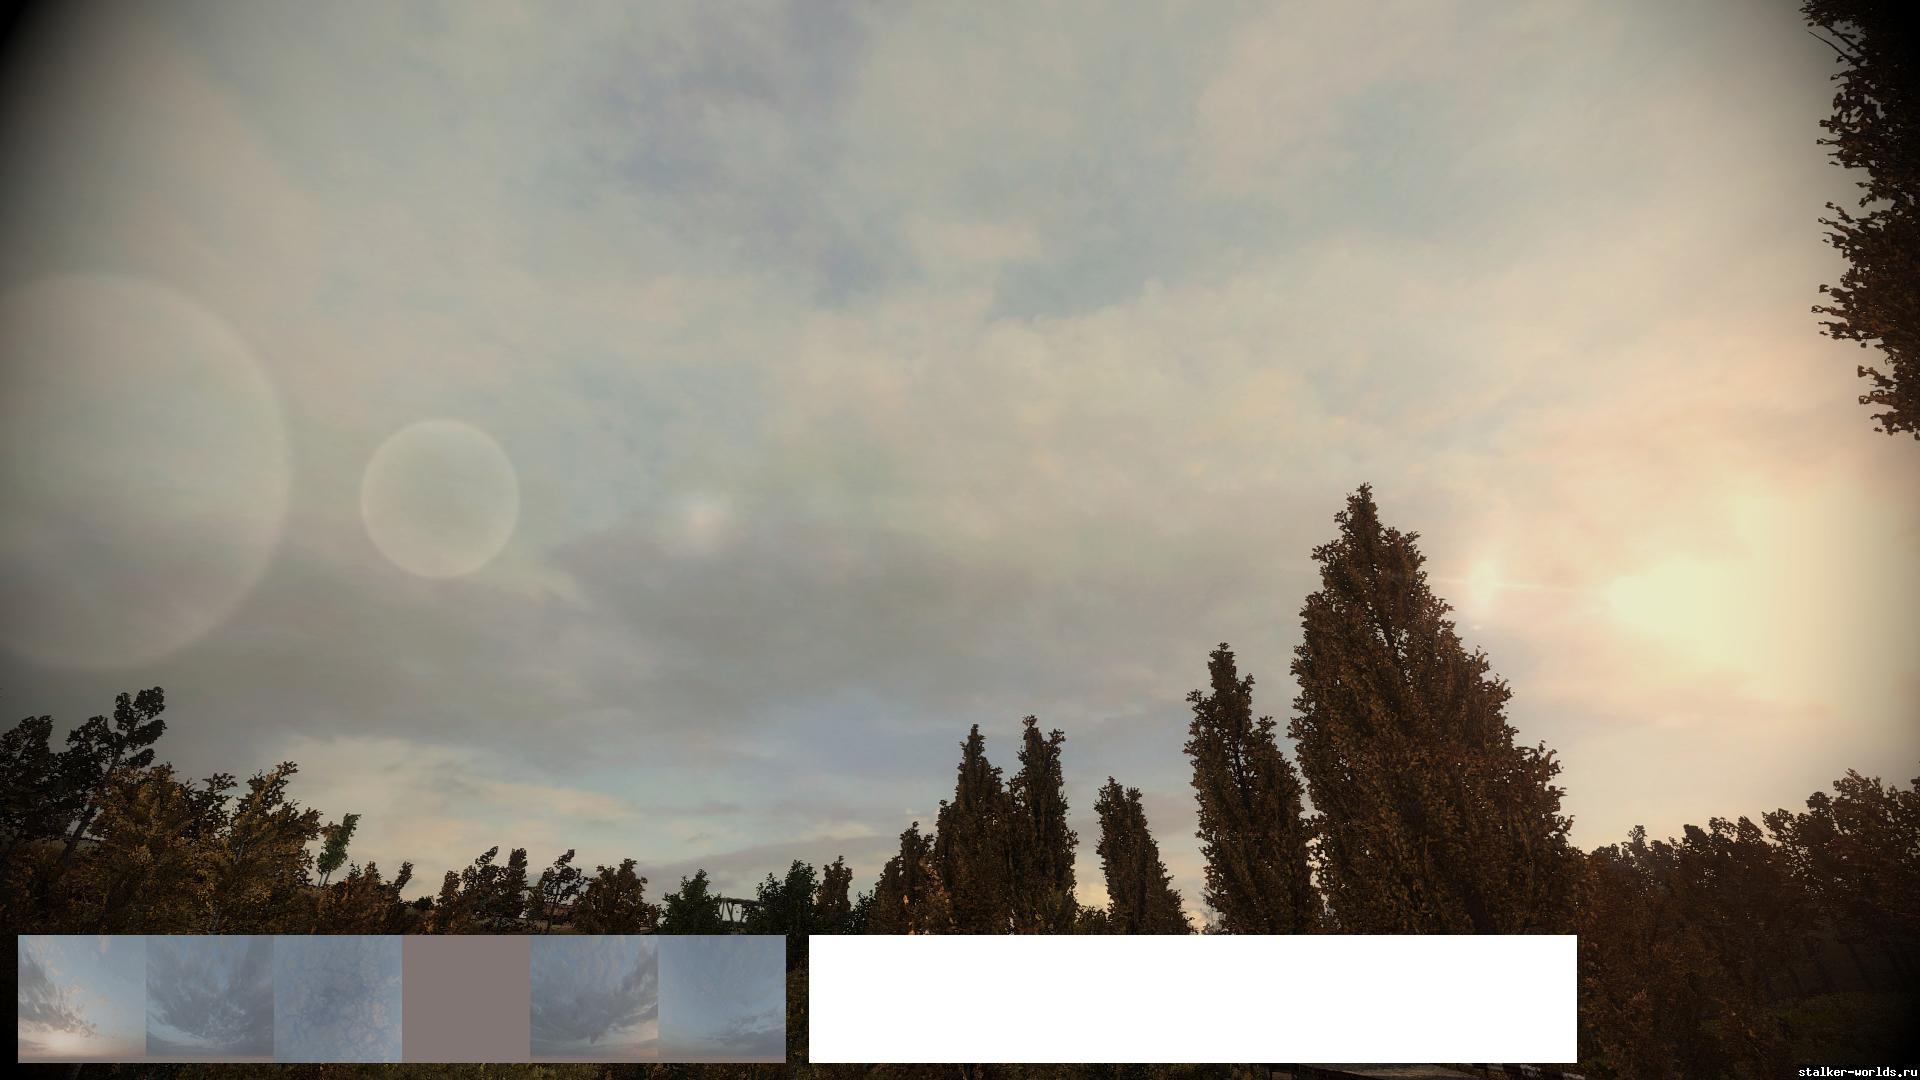 sw_1517131782__07-00_dxt5_skycube_a_whit